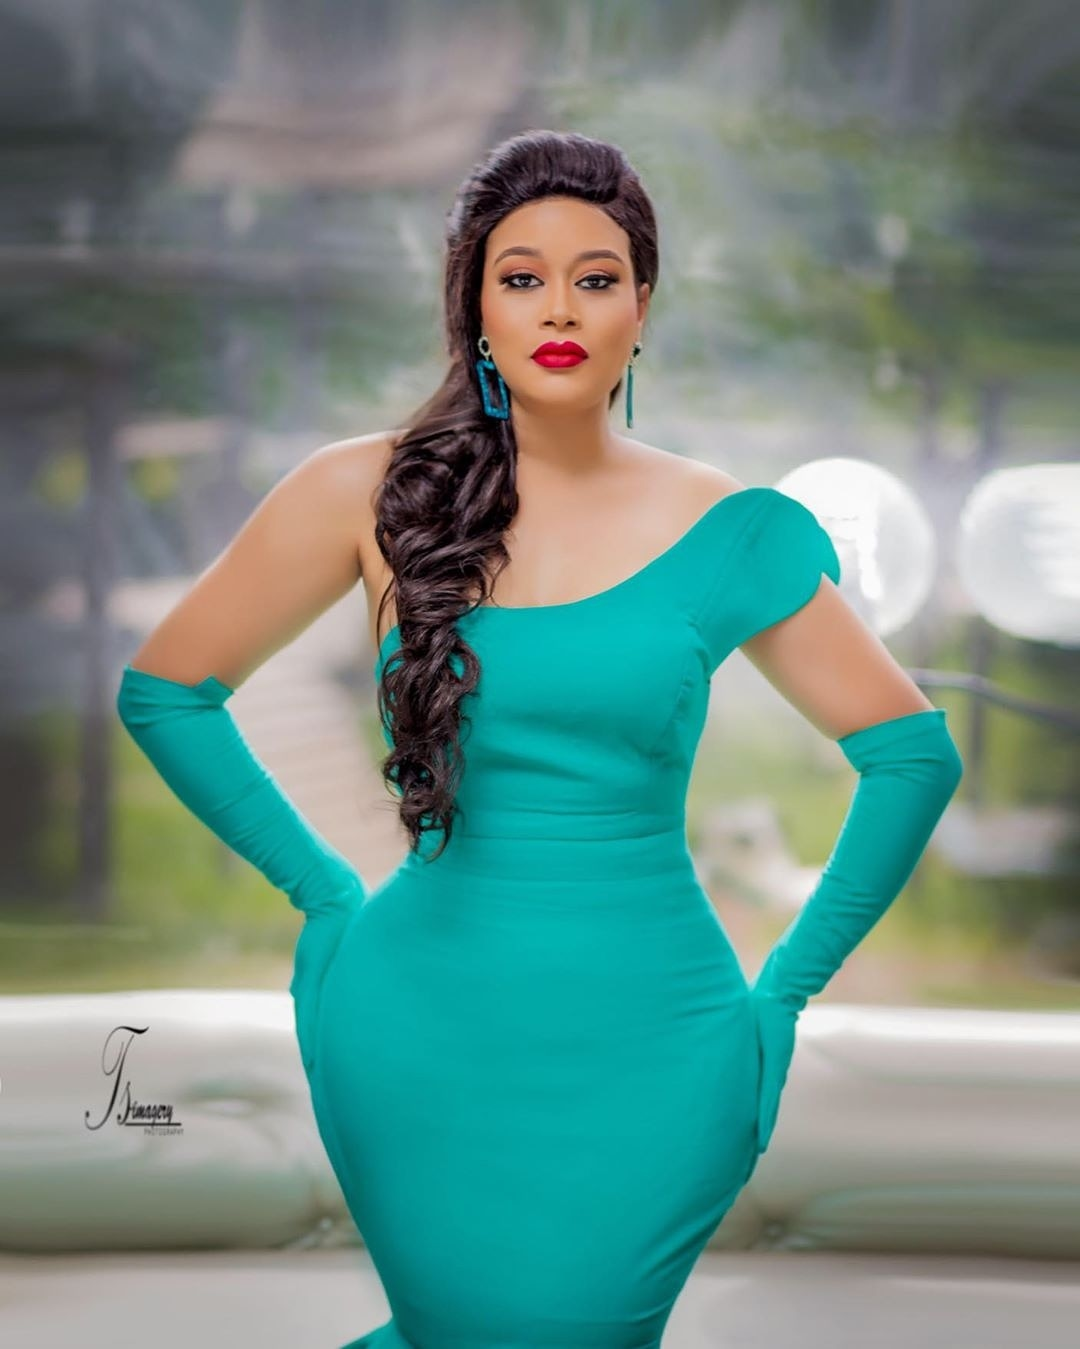 Adunni Ade Stuns In Turquoise Blue Mono Strap Dress As She Celebrates Birthday